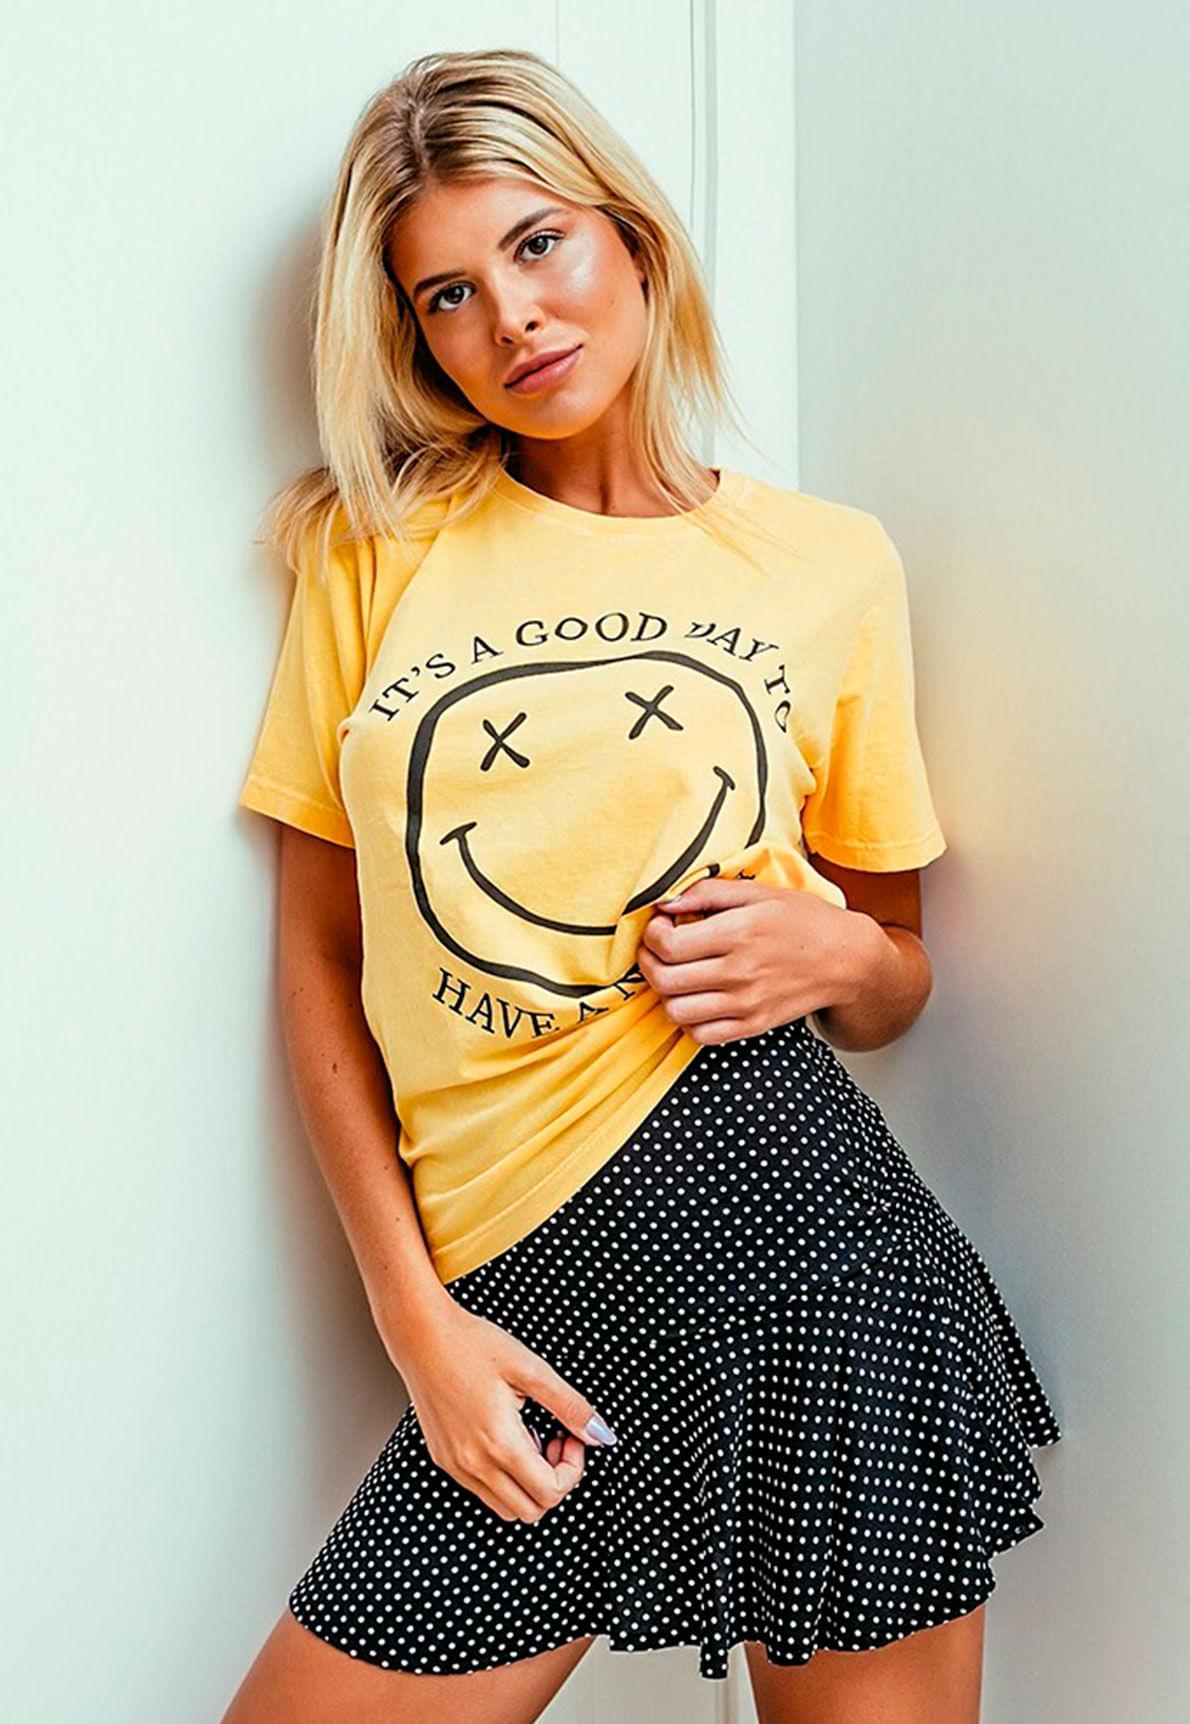 30913-t-shirt-its-a-good-day-mundo-lolita-07